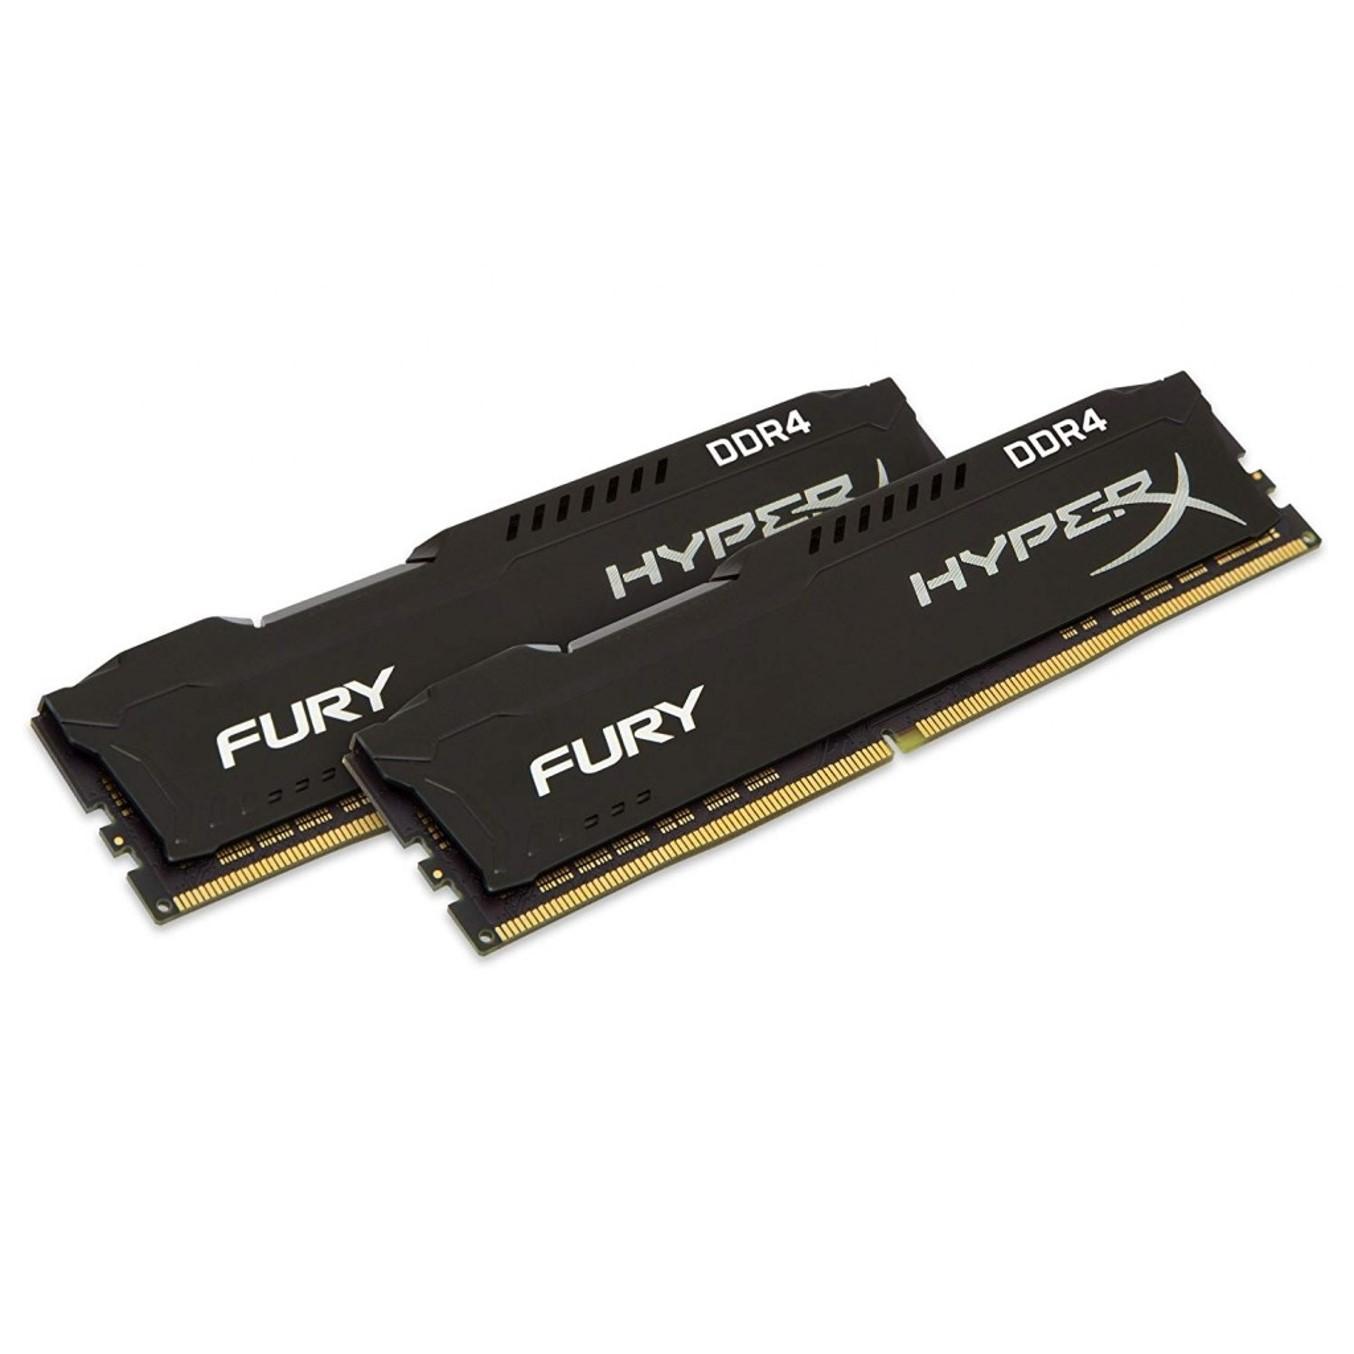 MEMORIA DDR4 16GB (2 X 8GB) PC4-19200 2400MHZ CL15